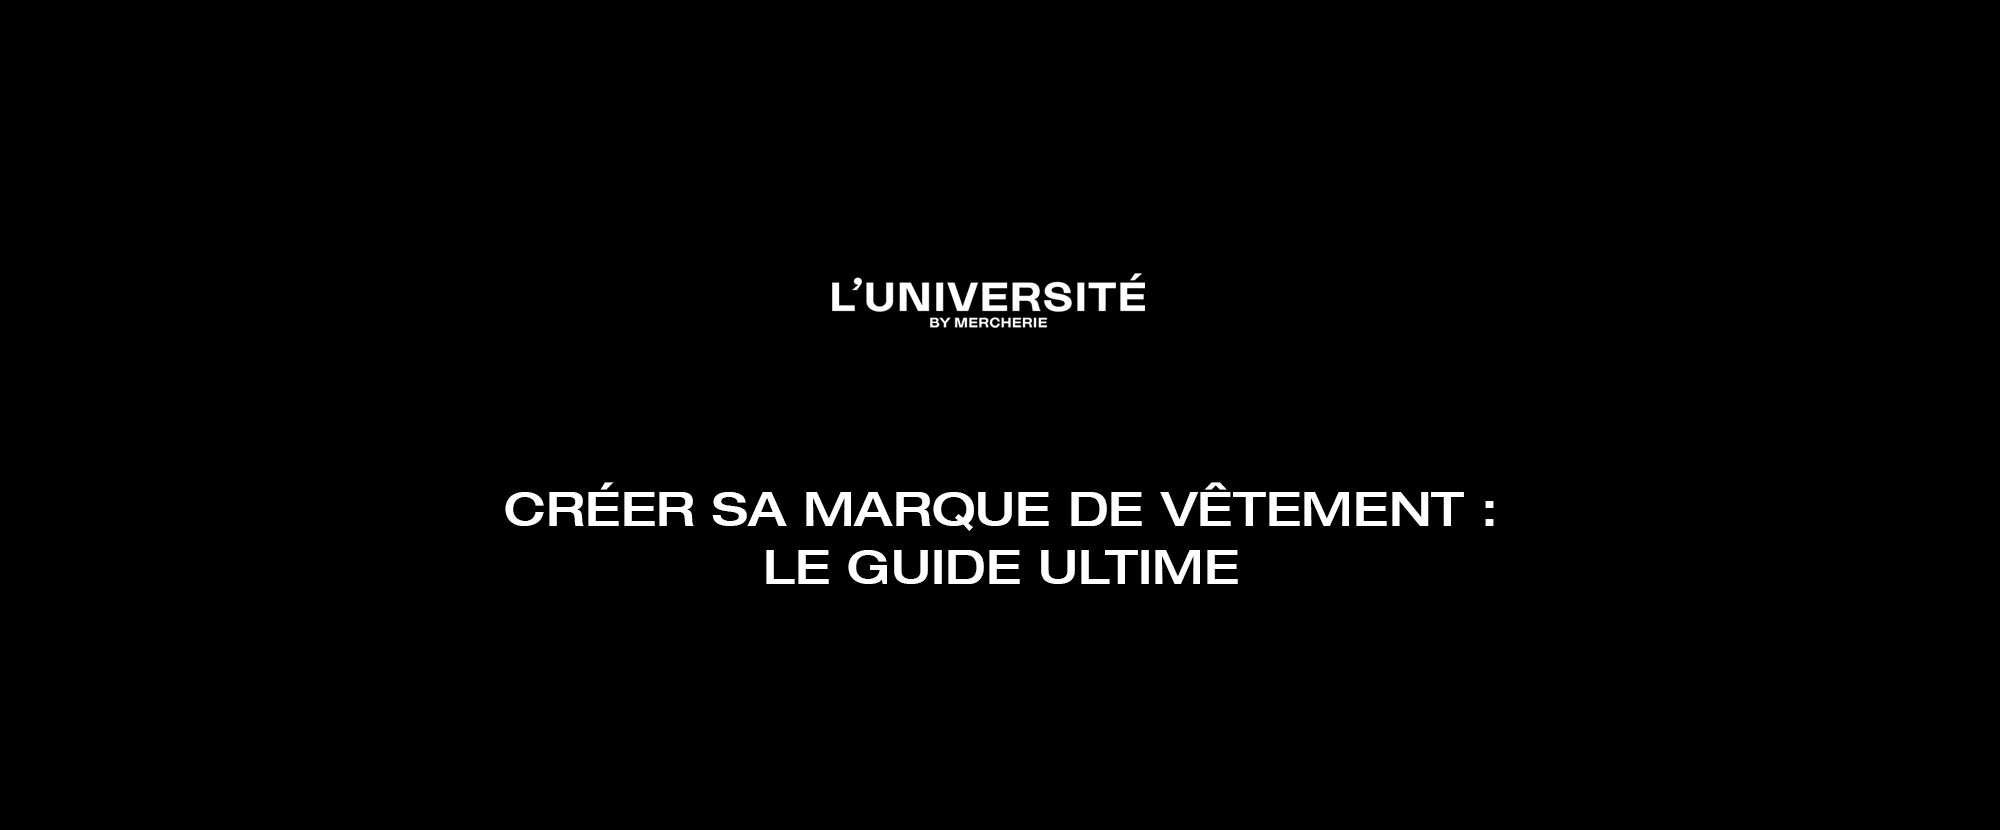 You are currently viewing Créer sa marque de vêtement : le guide ultime